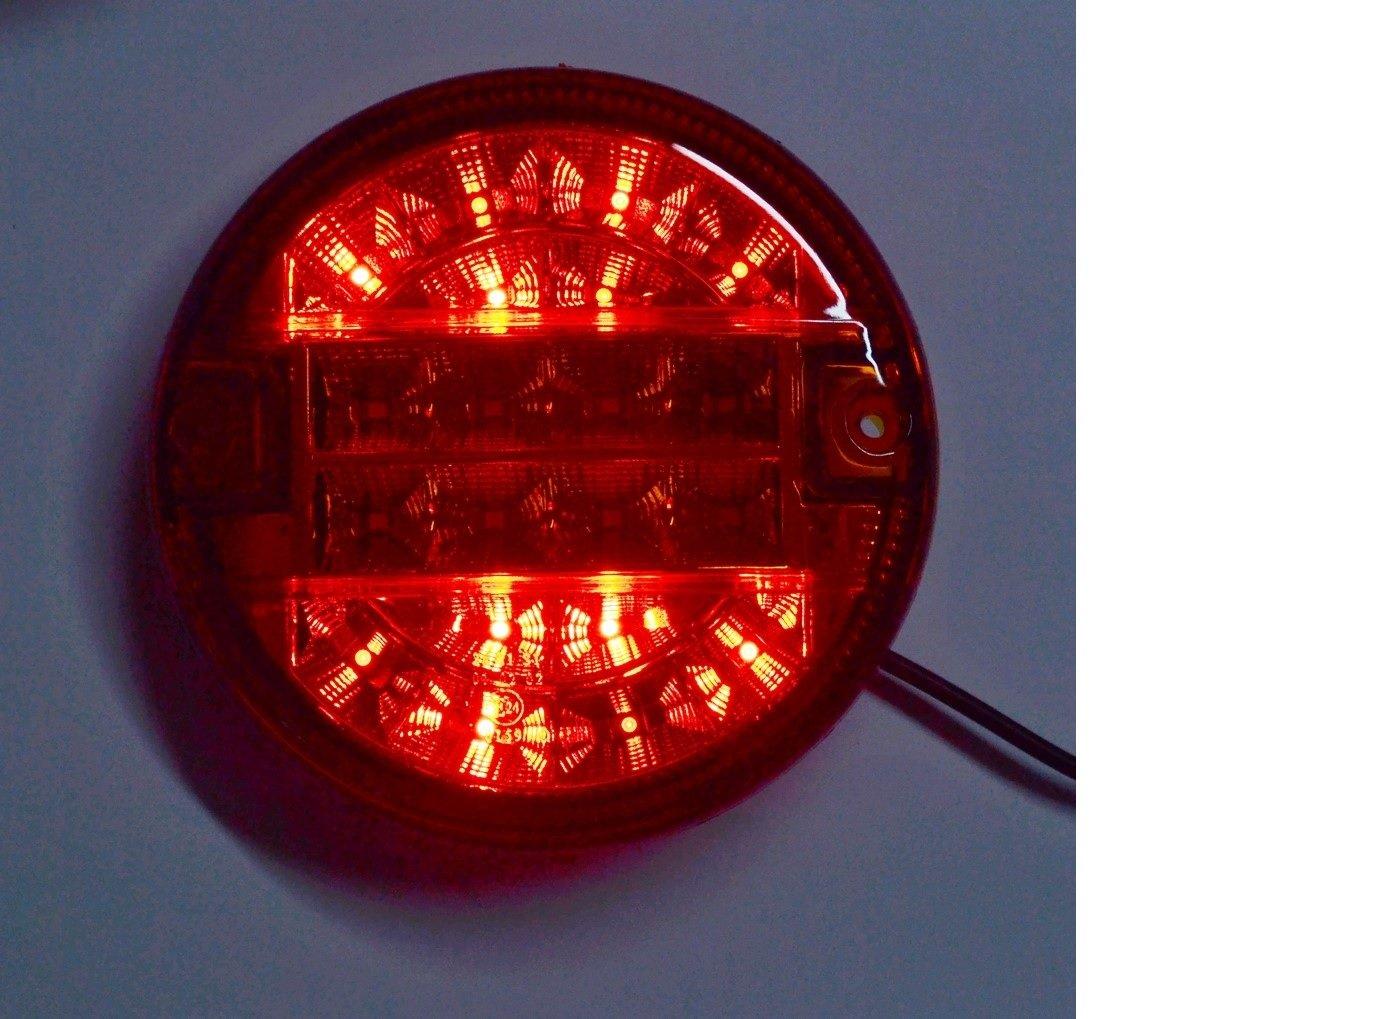 6/pezzi 24/V SMD LED Tail Lights hamburger stile luci posteriori camion rimorchio telaio ribaltabile caravan e-marked